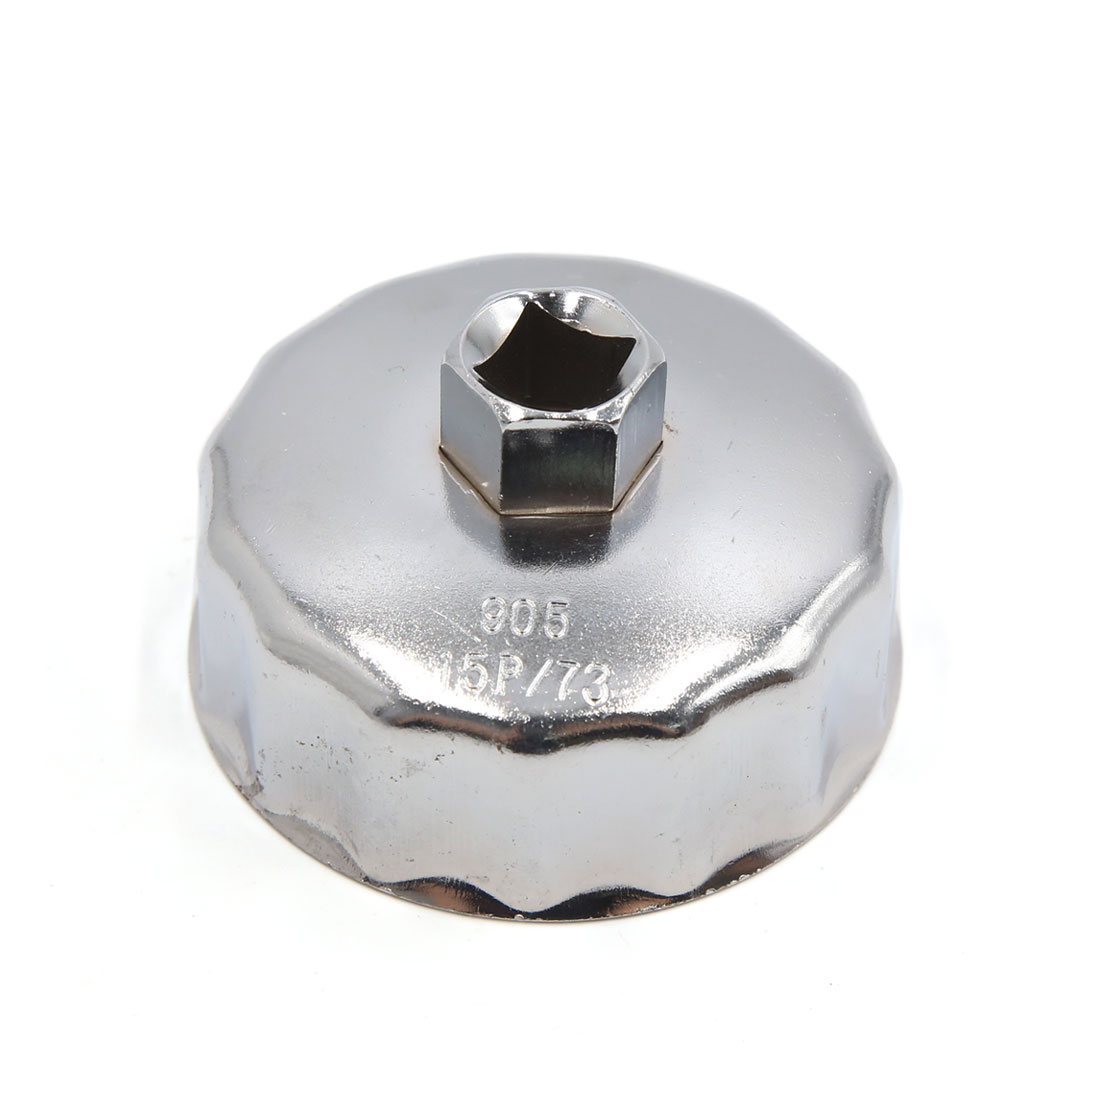 13mm Square Socket 15 Flutes 73mm Inside Diameter Cap-Type Oil Filter Wrench Spanner for Car Vehicle